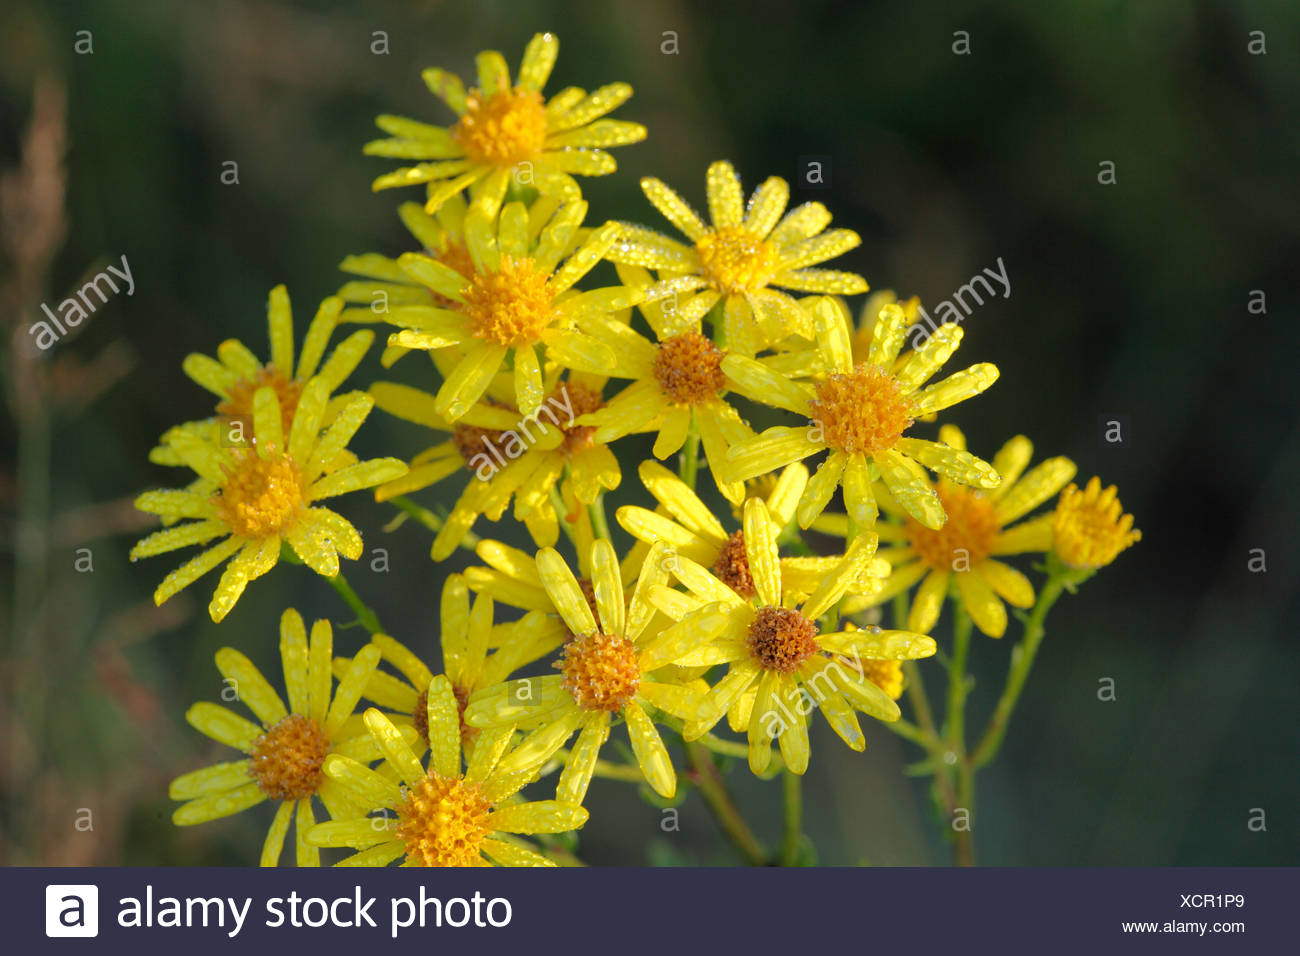 Flowers of Ragwort (Senecio jacobaea) with dewdrops, poisonous plant - Stock Image